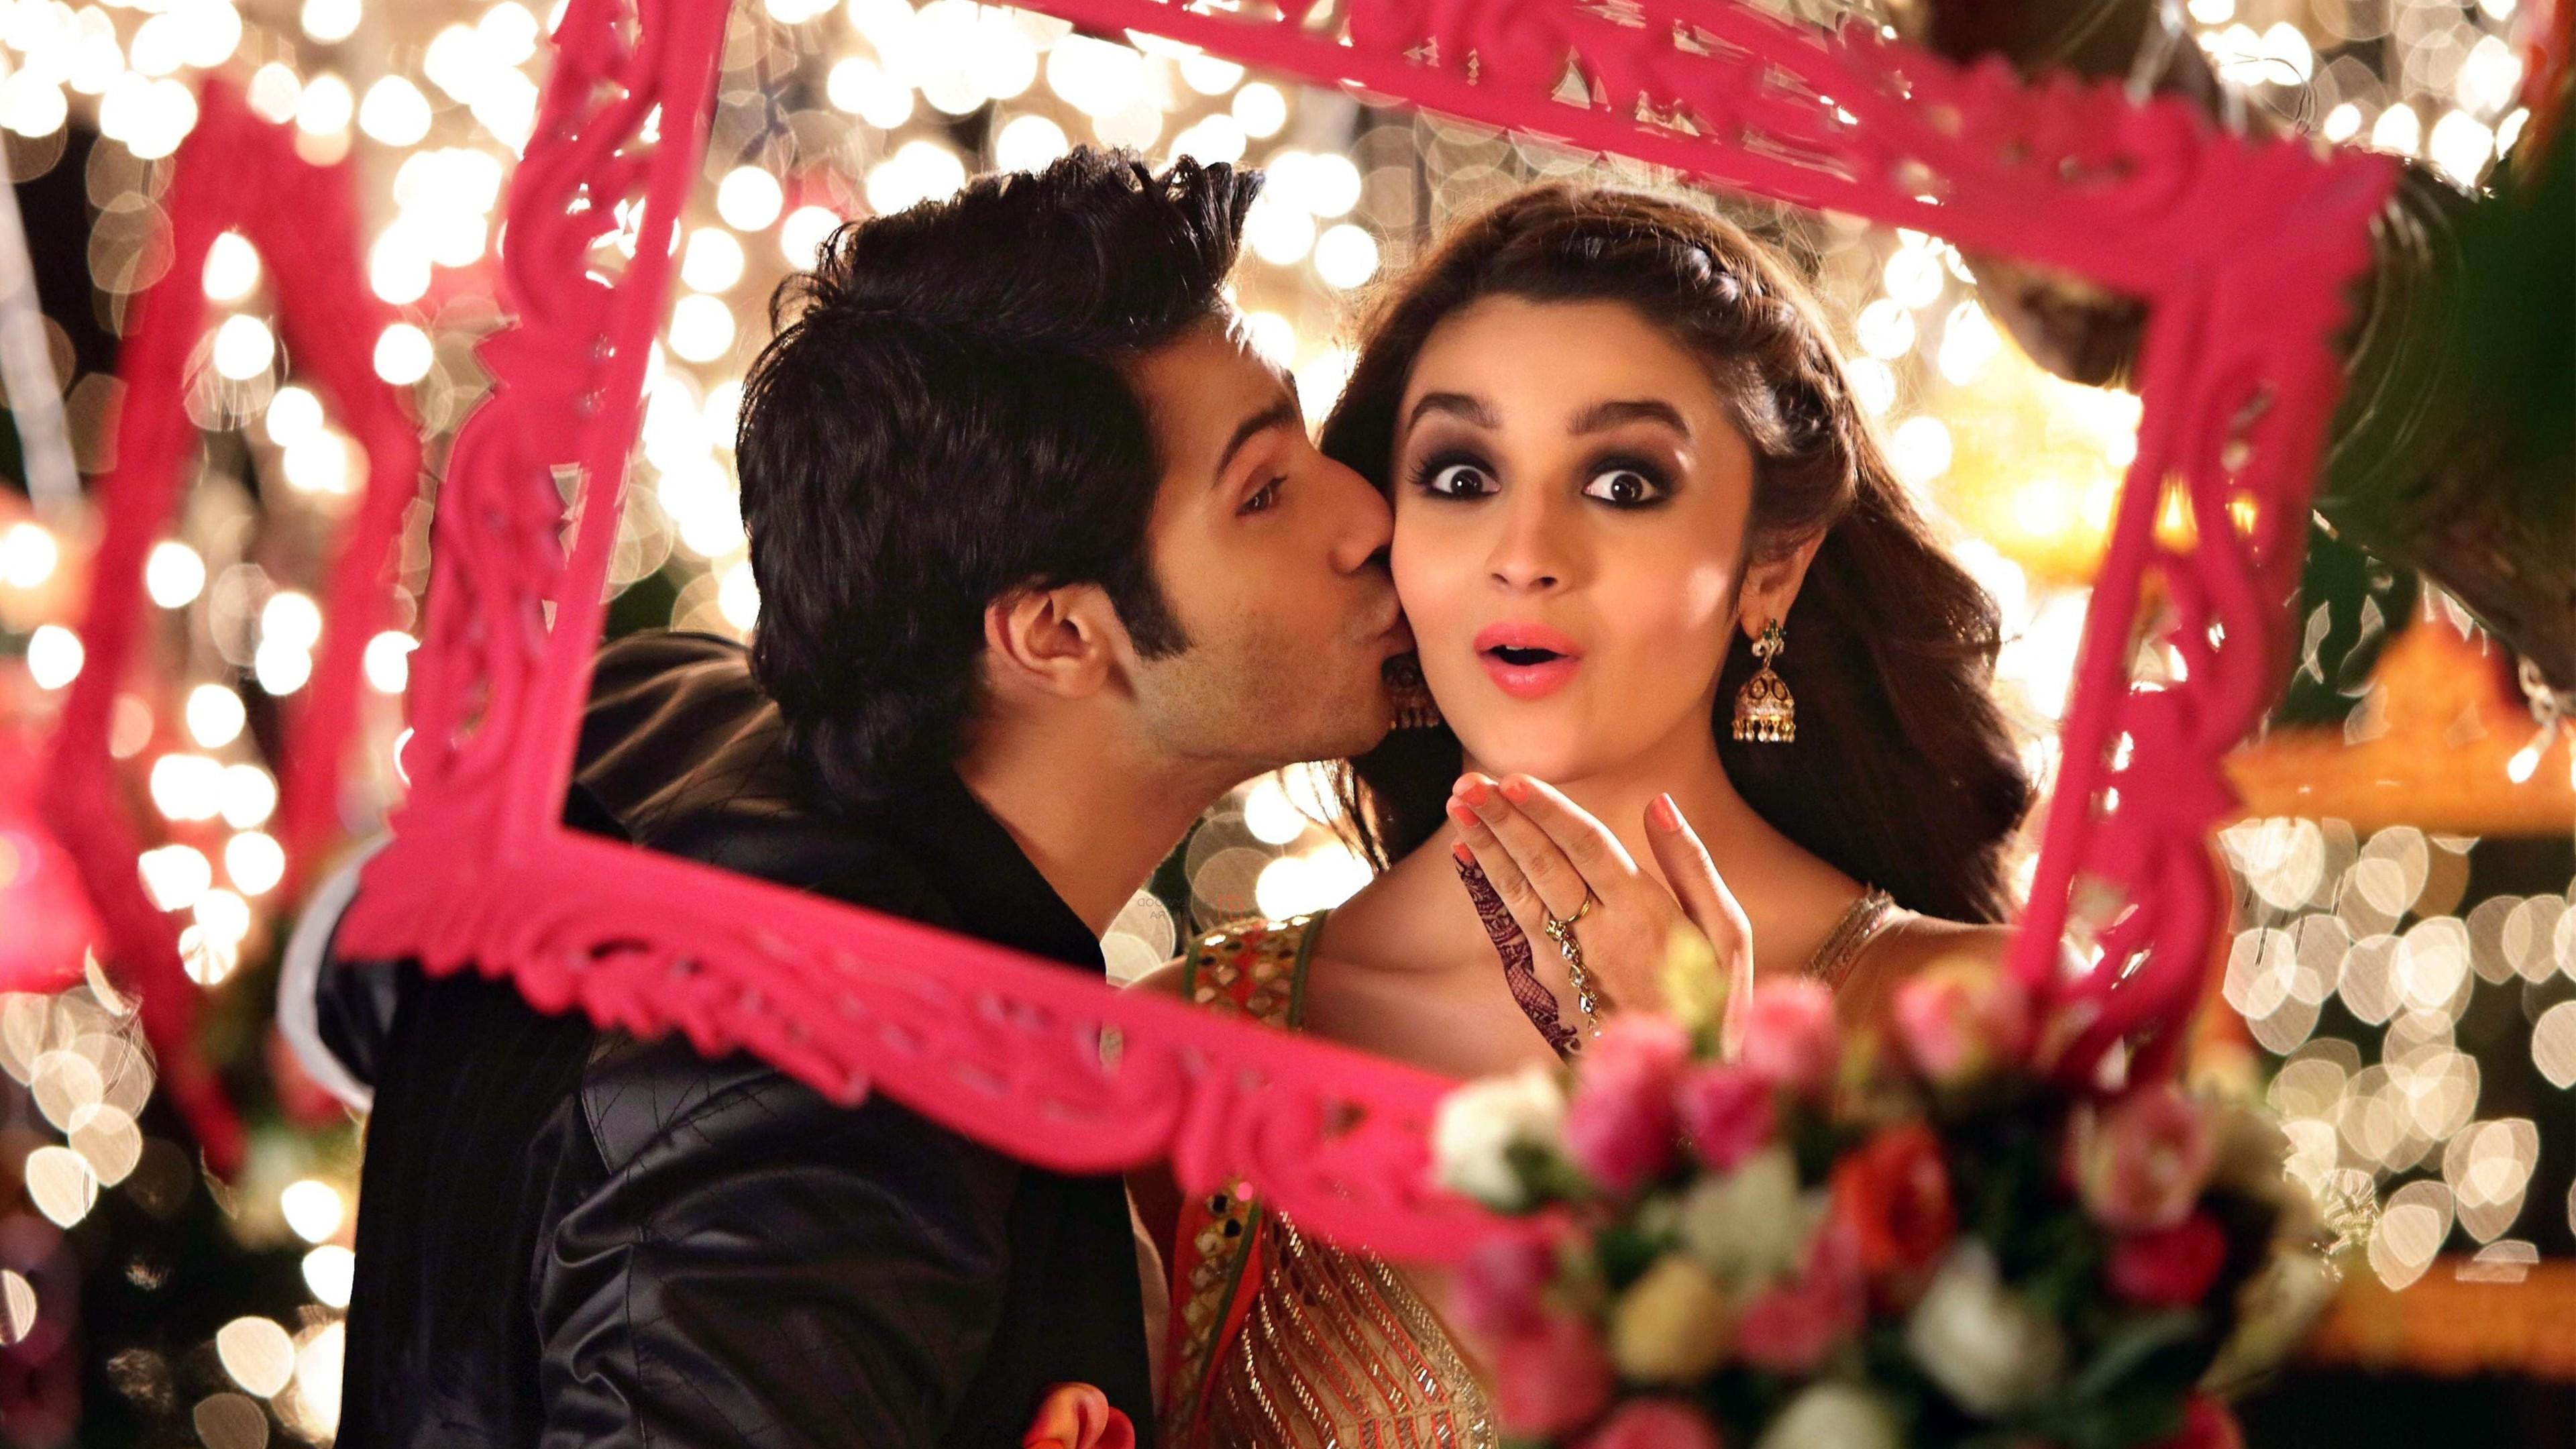 Alia Bhatt Kissing Varun Dhawan, HD Indian Celebrities, 4k